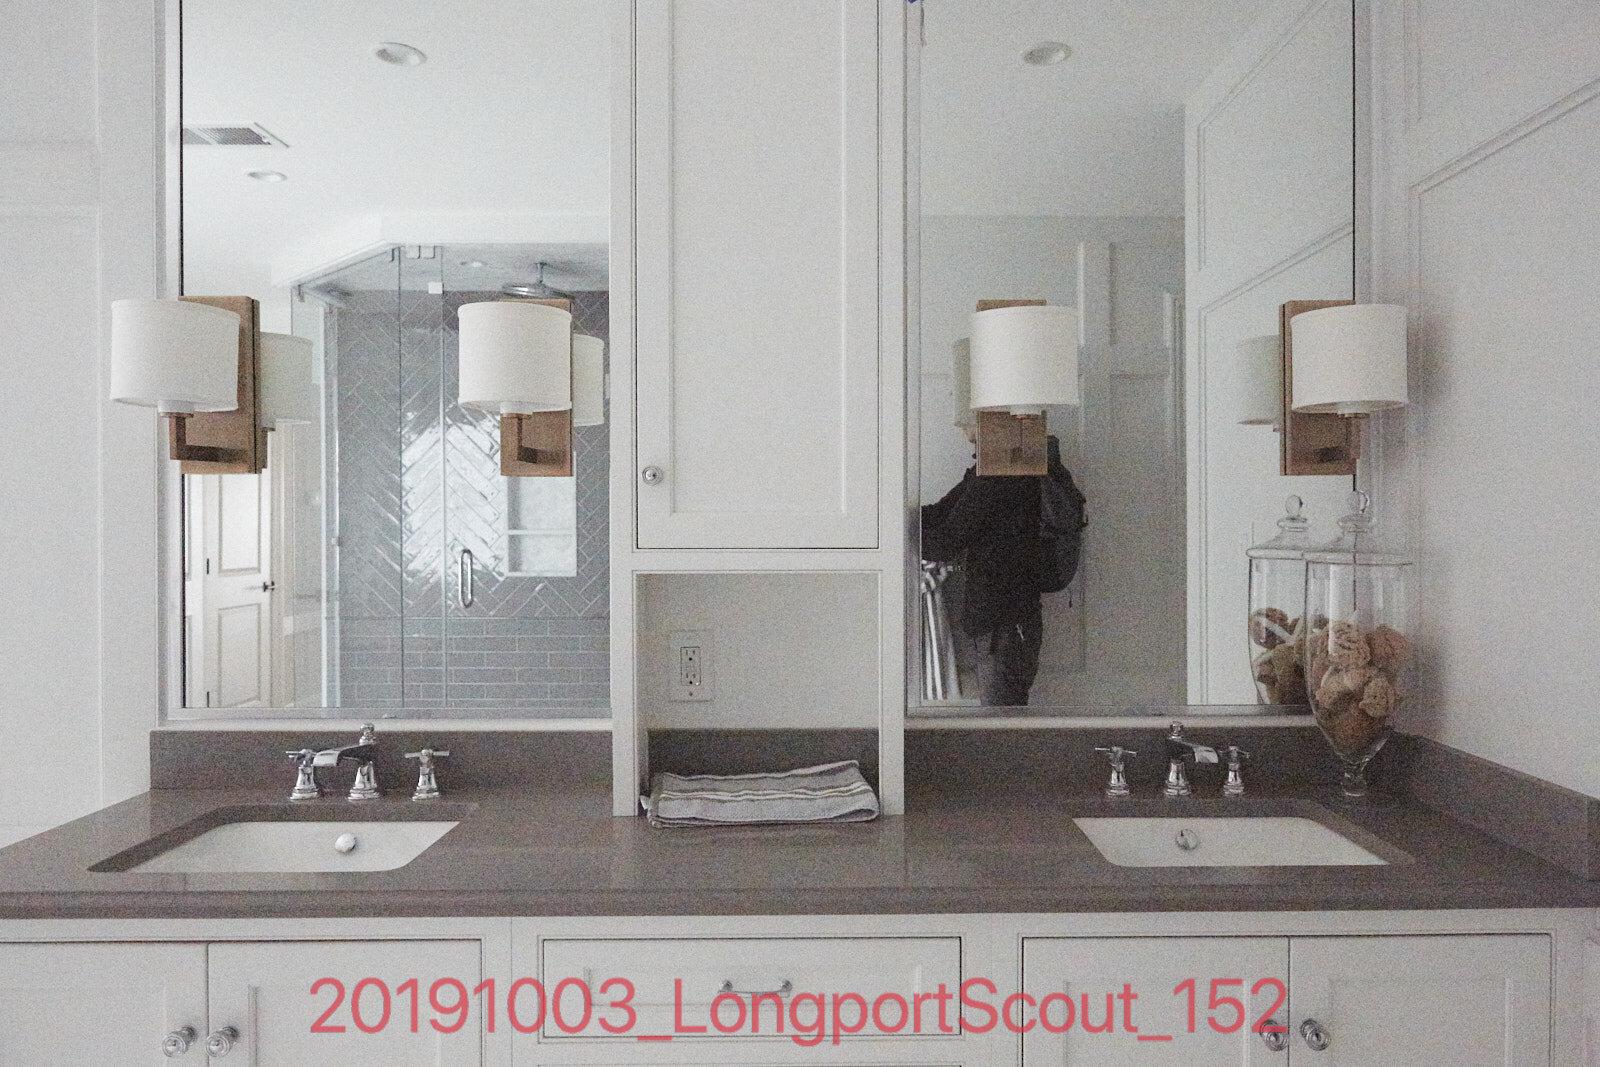 20190904_151Fairview_Proofs_050.jpg